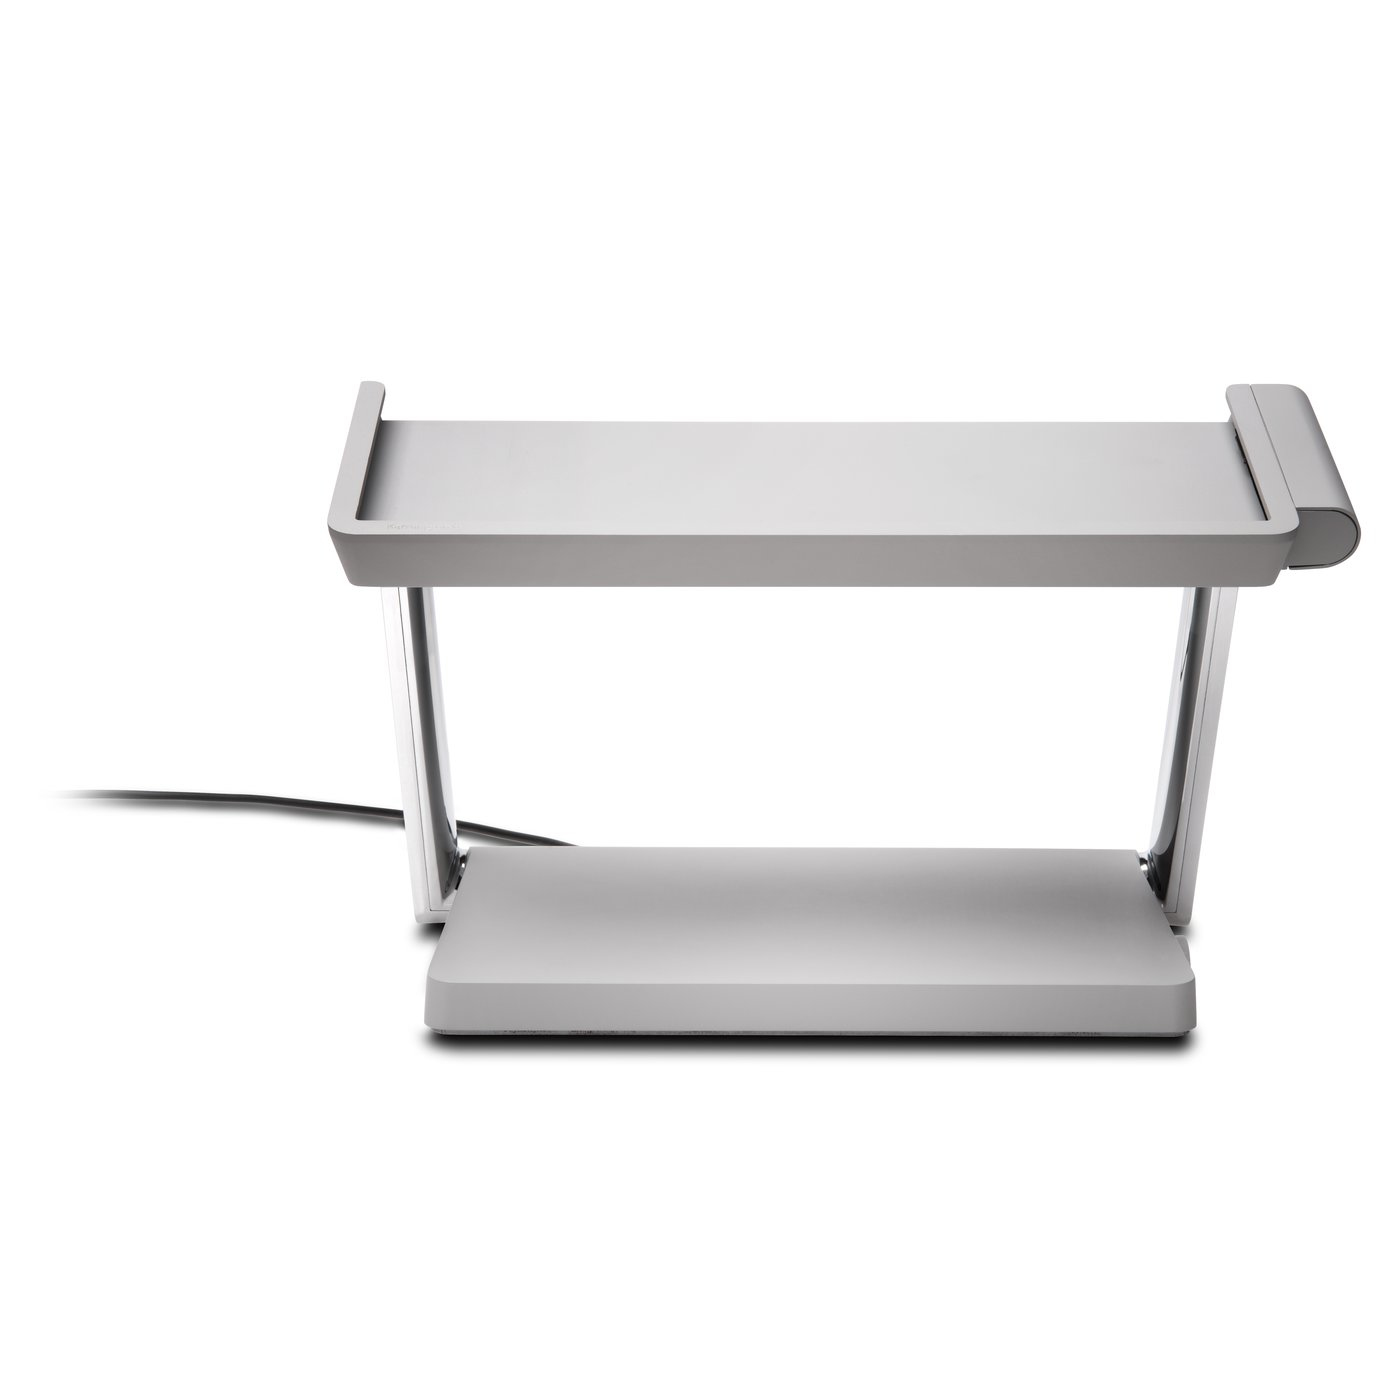 Kensington SD7000 Surface Pro Docking Station - 5Gbps - DP/HDMI - Windows 10